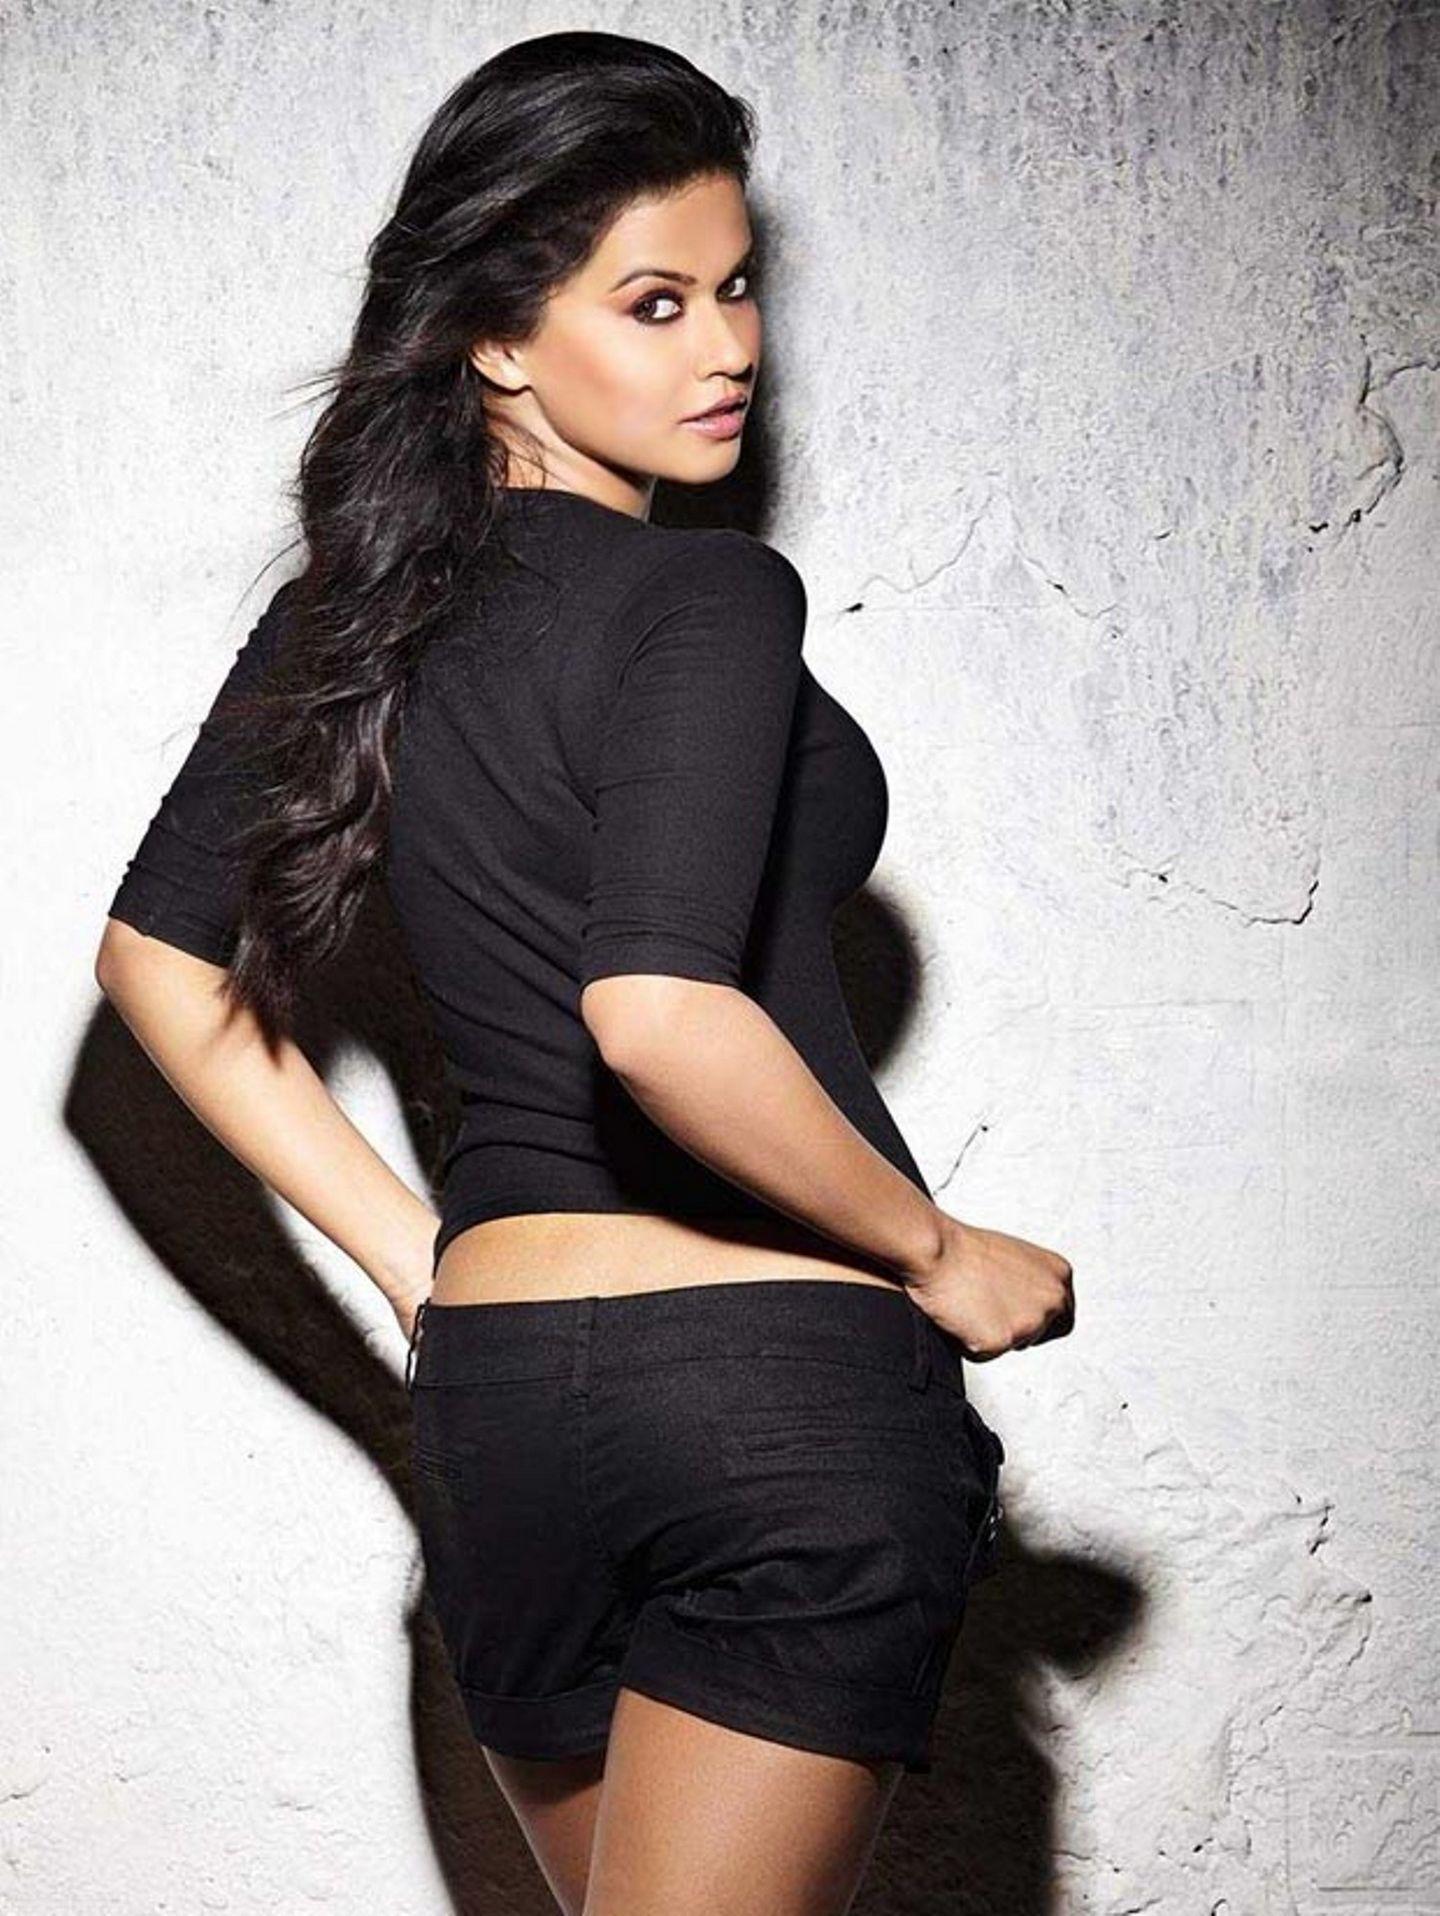 Sharmila mandre backside photos